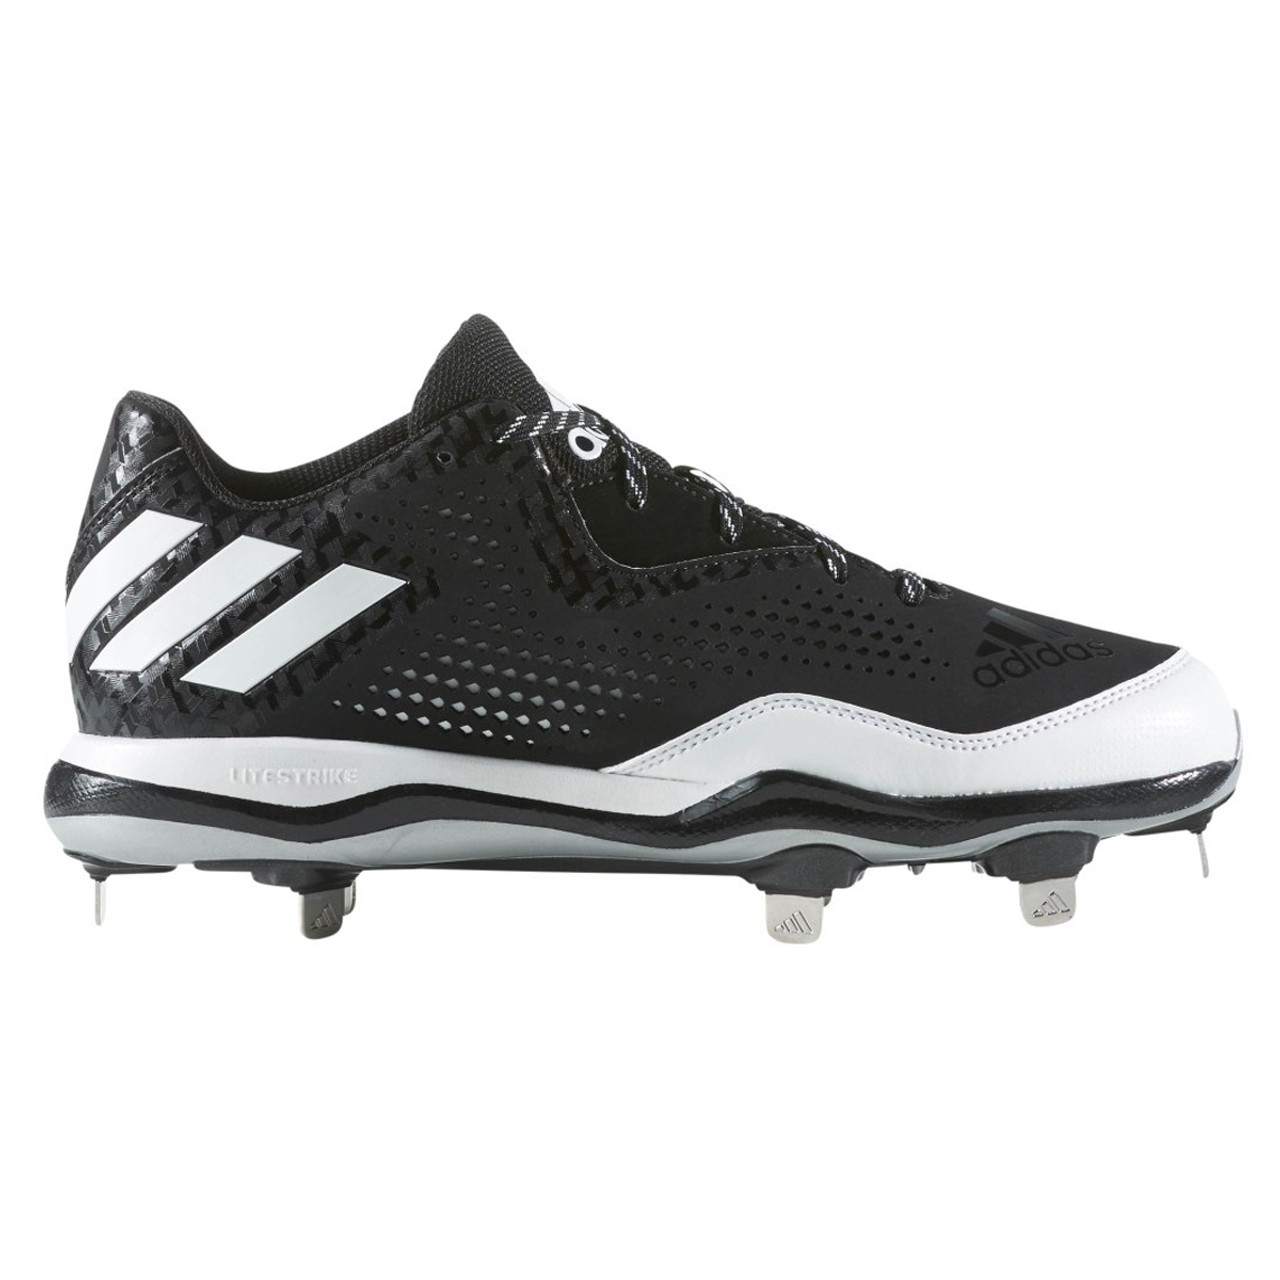 499315ebe Adidas Power Alley 4 Low Men s Metal Baseball Cleats Q16481 - Black